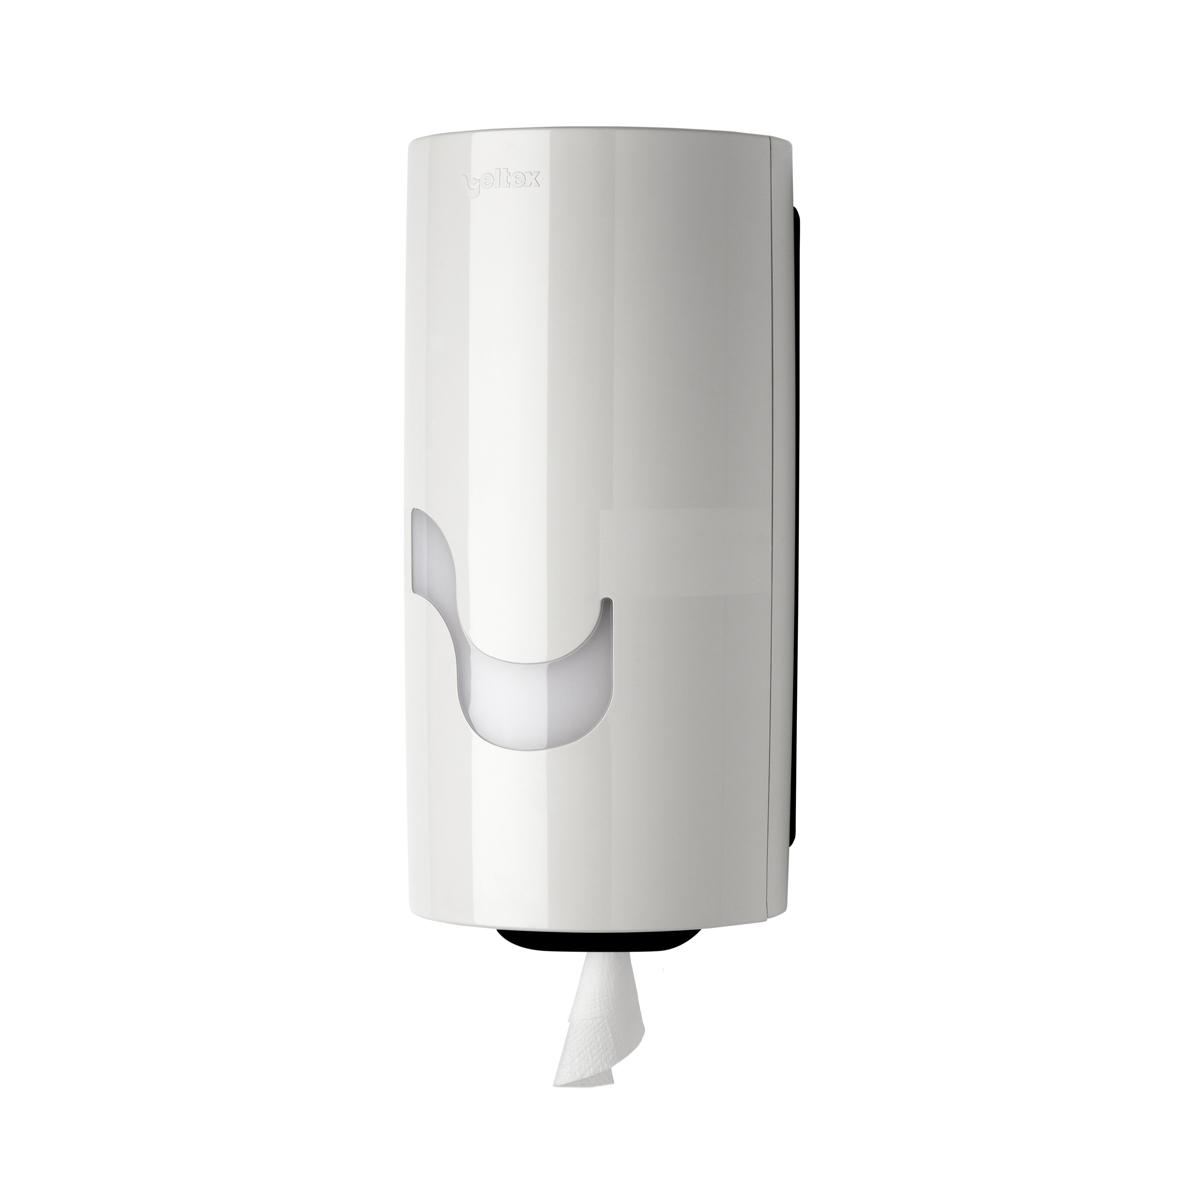 Handtuchrollenspender mini perfo Box weiß